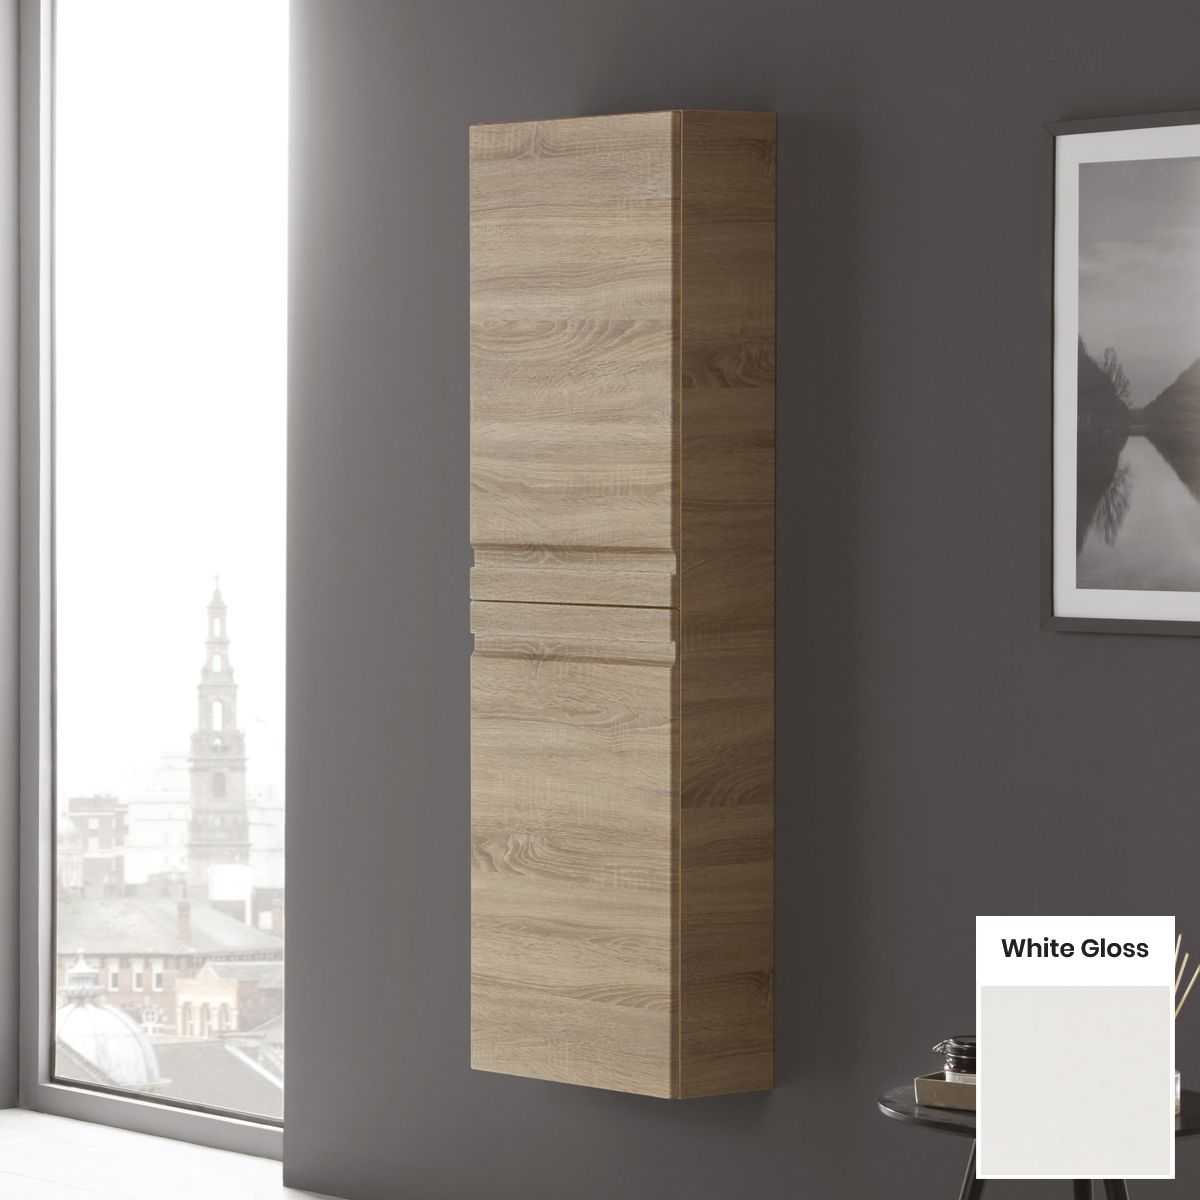 Elation Eko White Gloss Tall Unit with Slab Door 1500mm